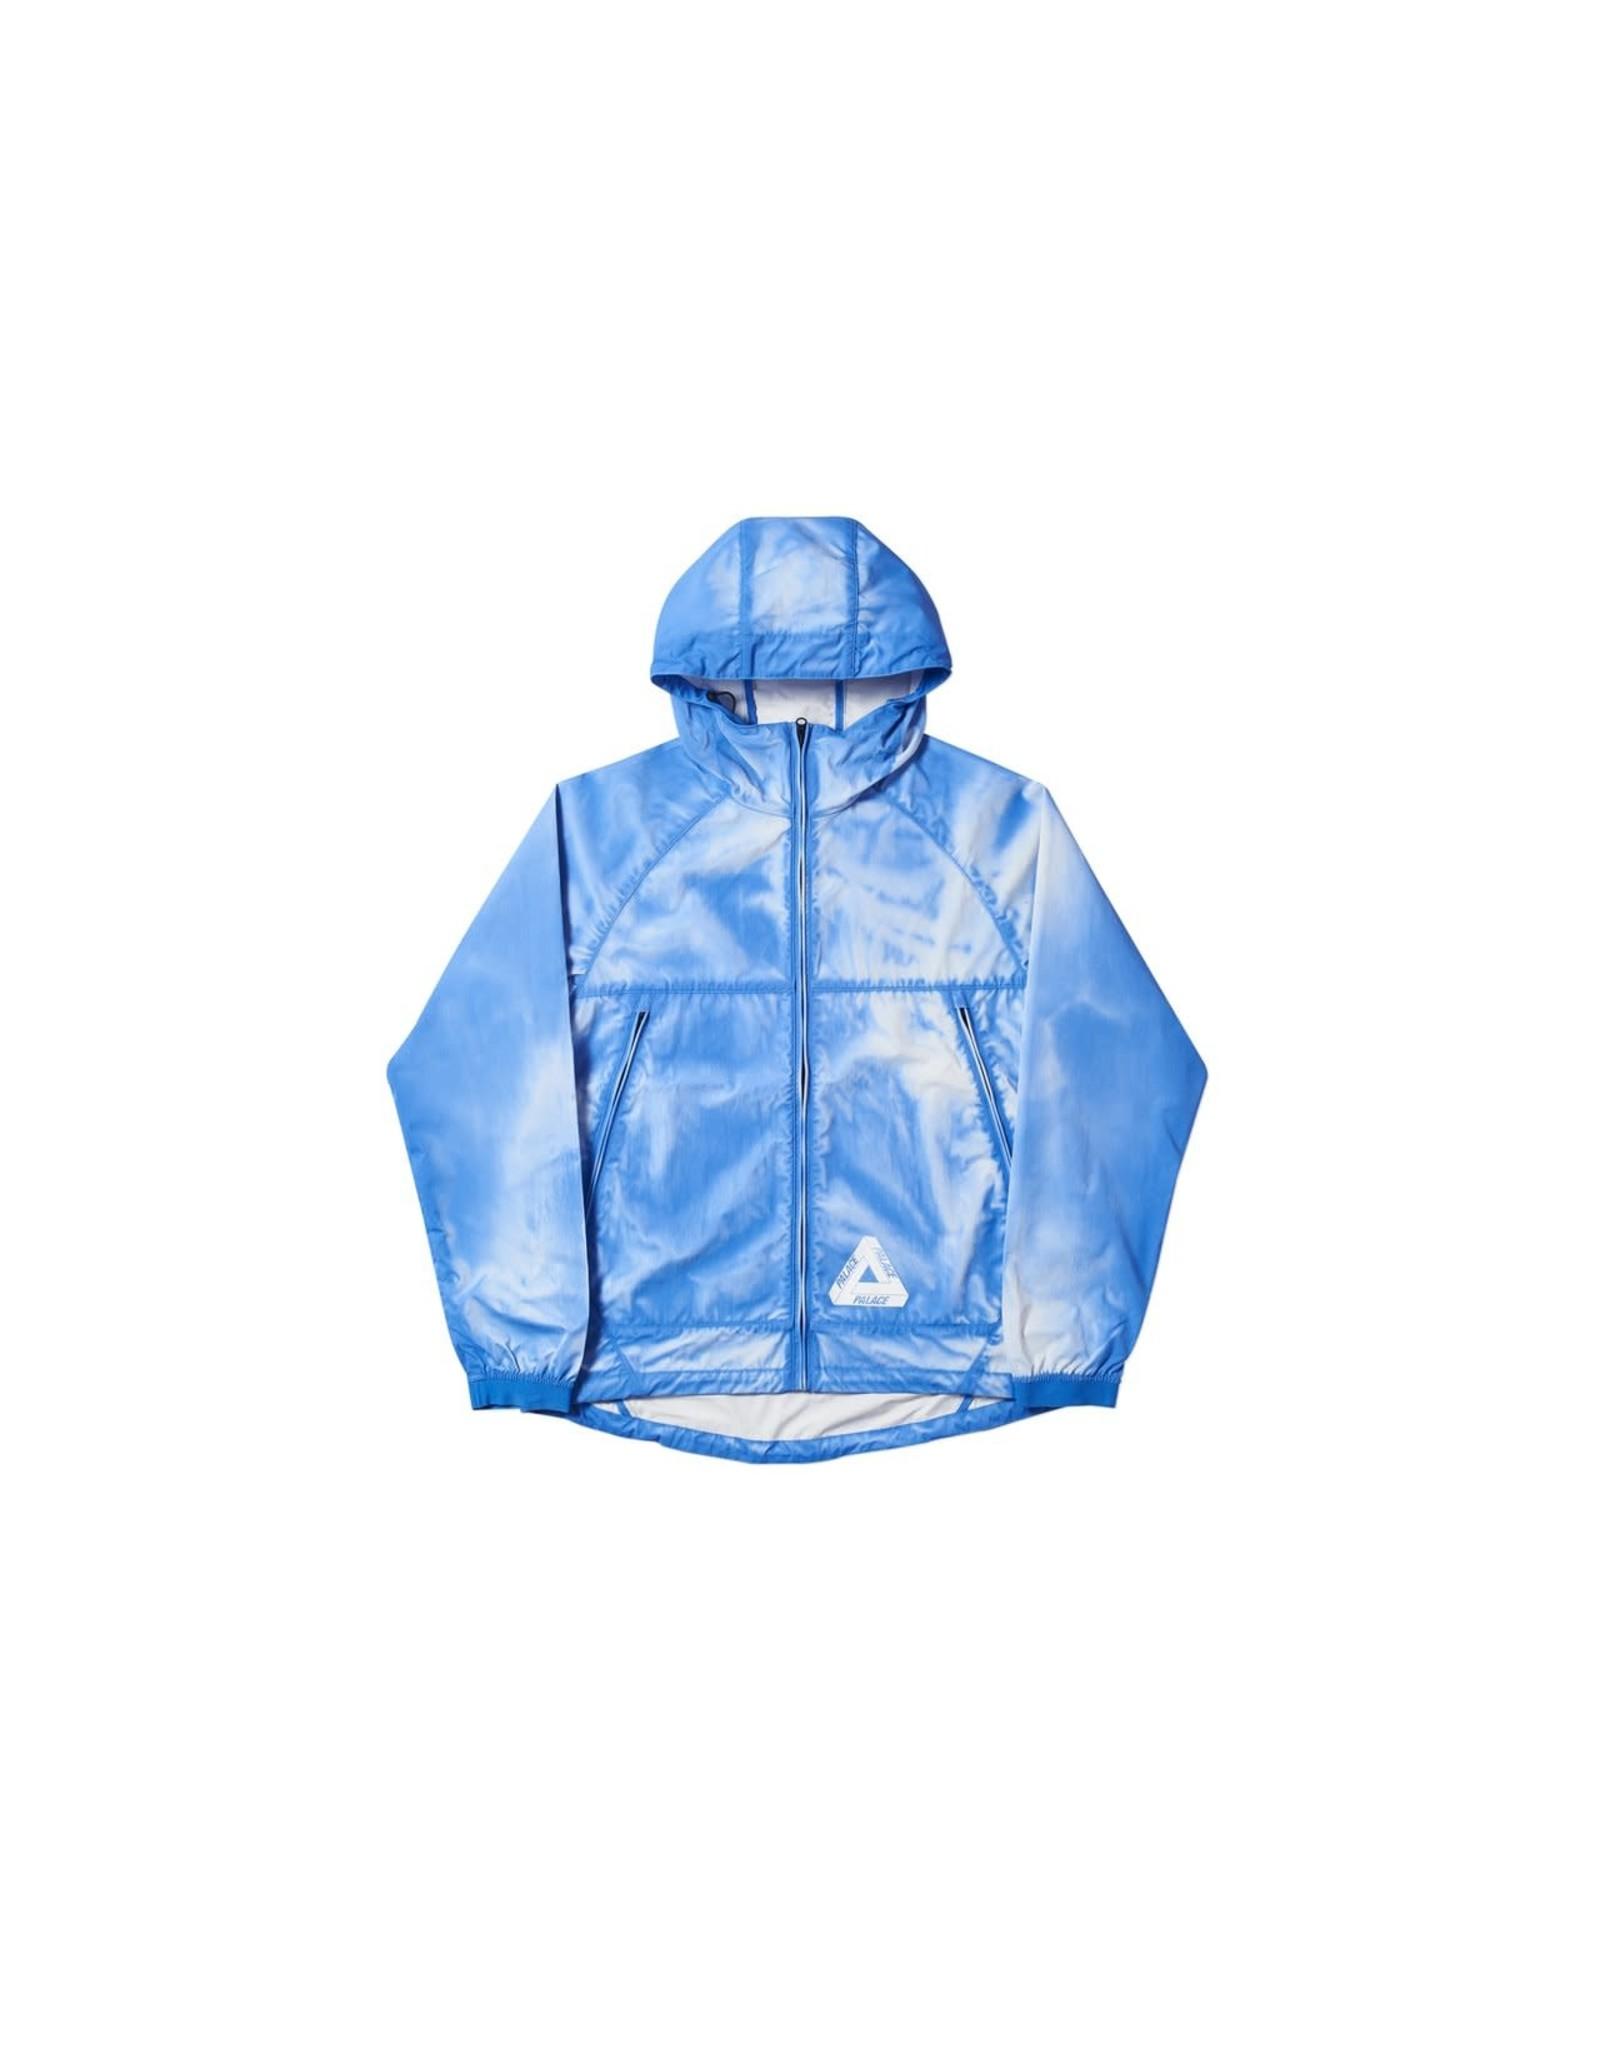 PALACE Reacto Jacket Hyper Blue LG